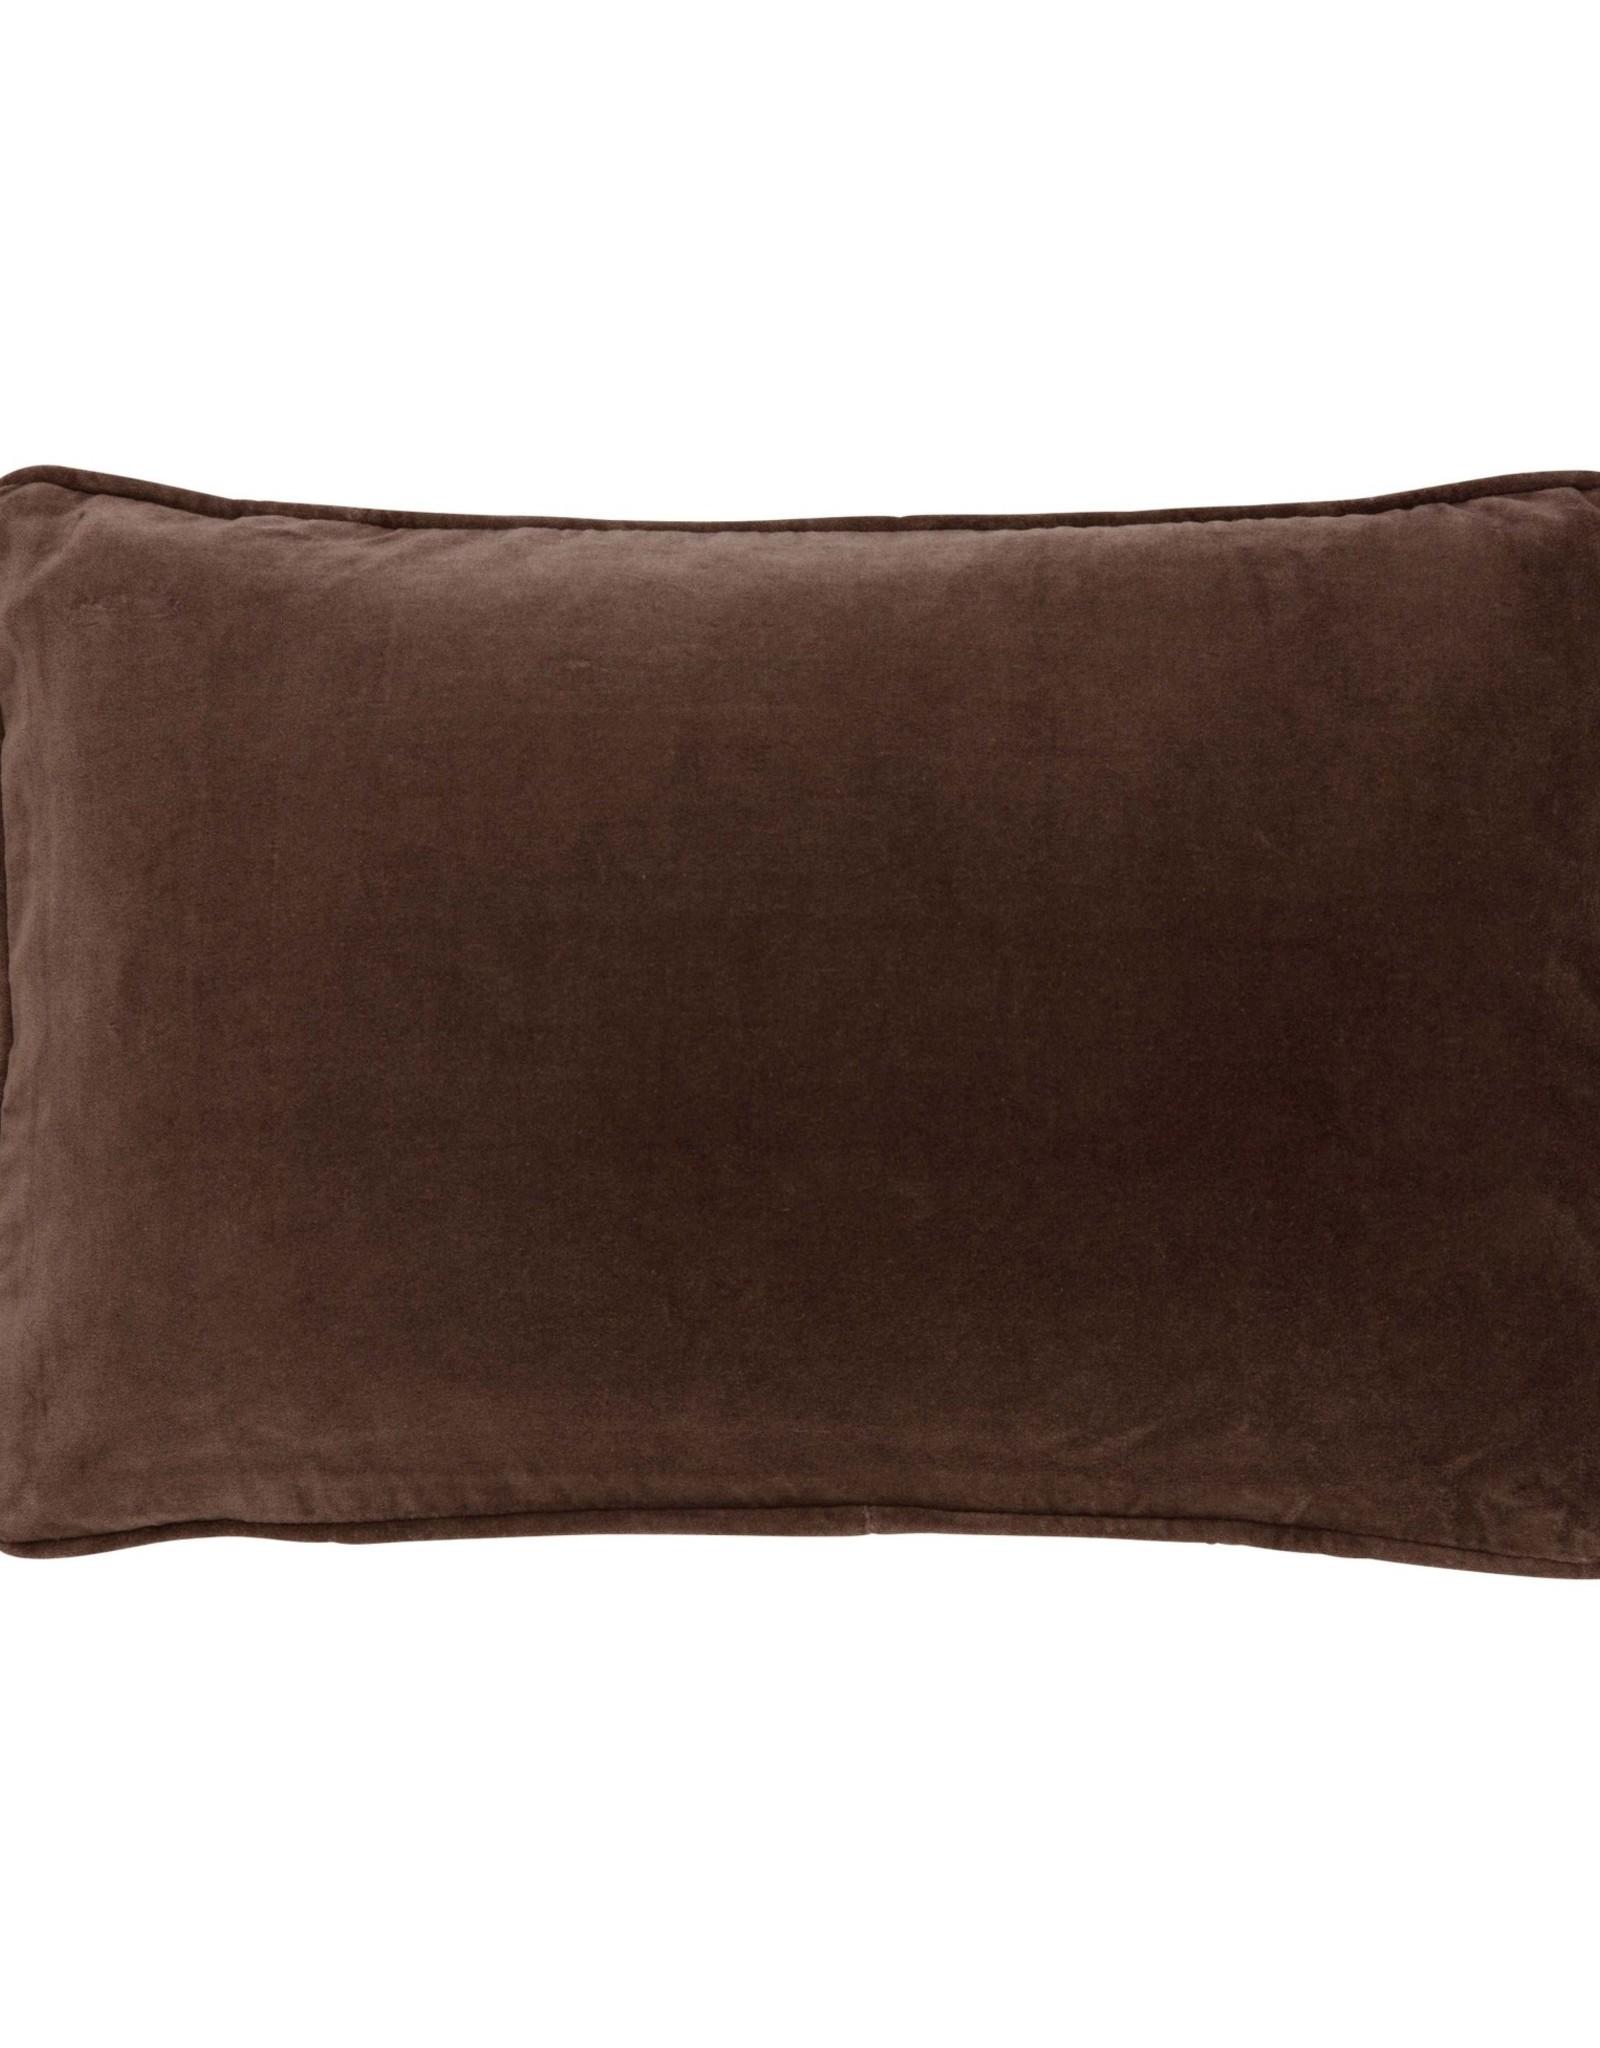 Bungalow Kussenhoes Velvet Chocolate - 33 x 50 cm